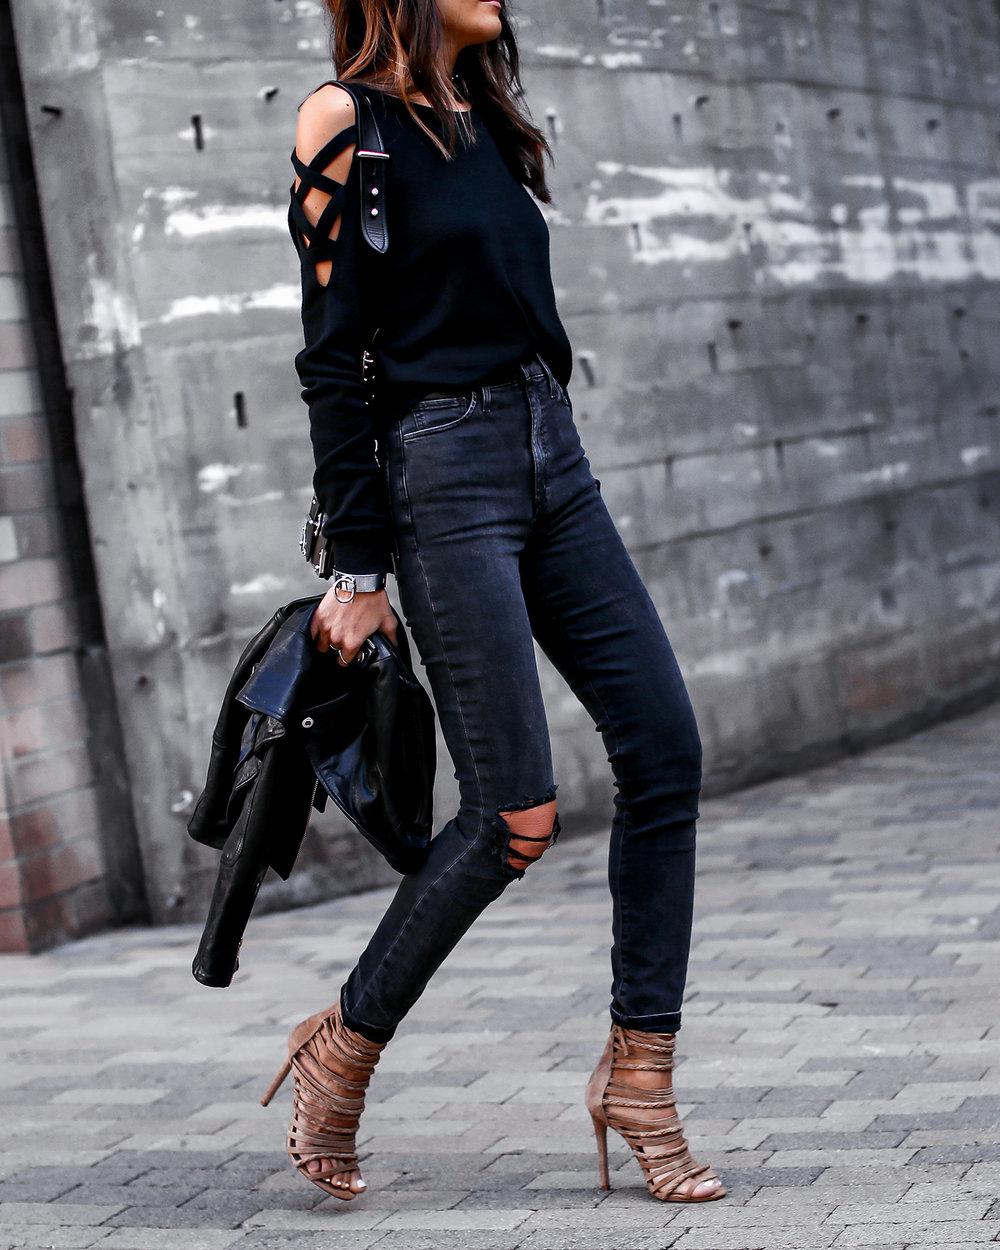 Joes Jeans Acid Wash Denim Cutout Sweater Steve Madden Wrap Sandals Prada Cahier Bag.jpg